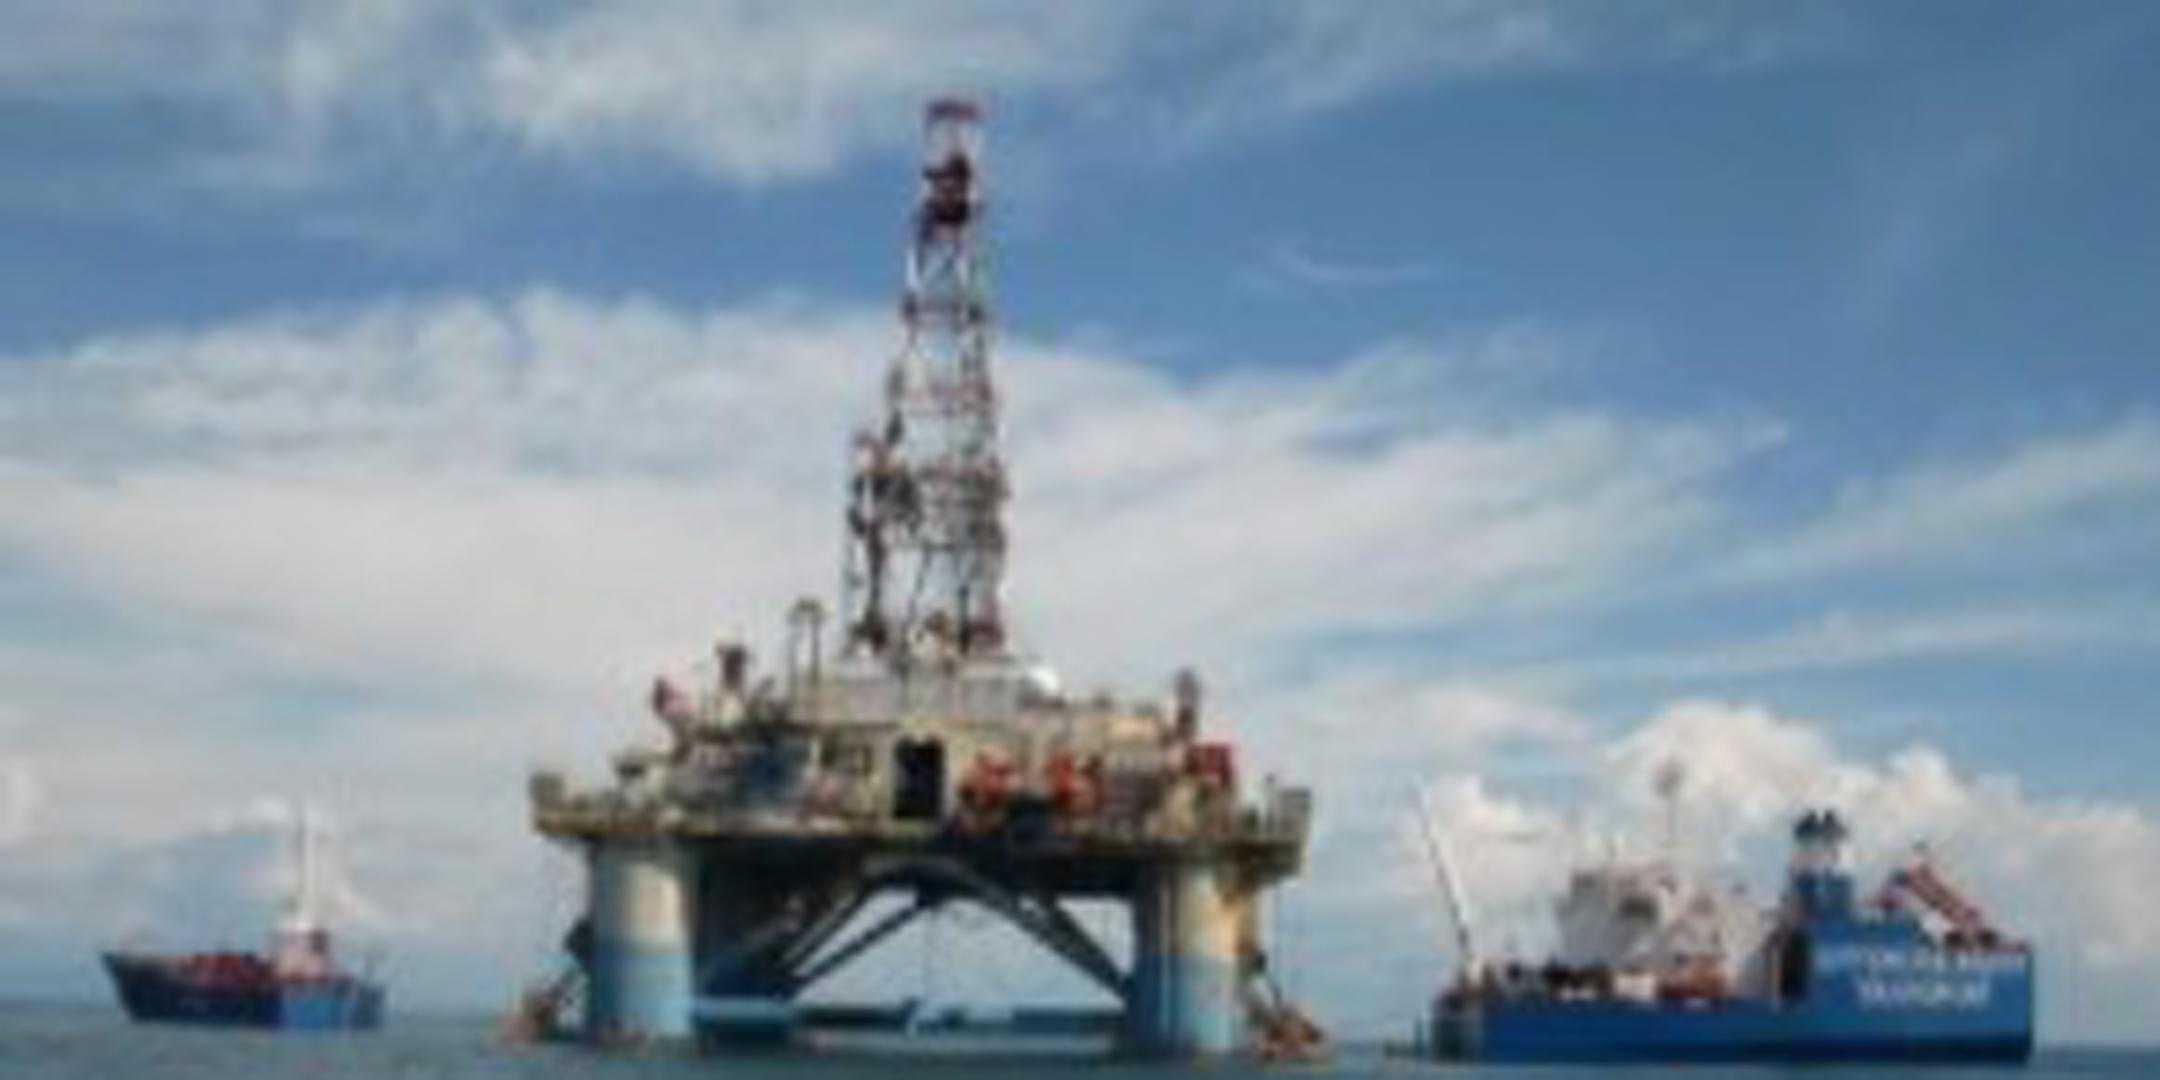 HPHT Well Design & Drilling Operations: Istanbul Etkinlik Afişi